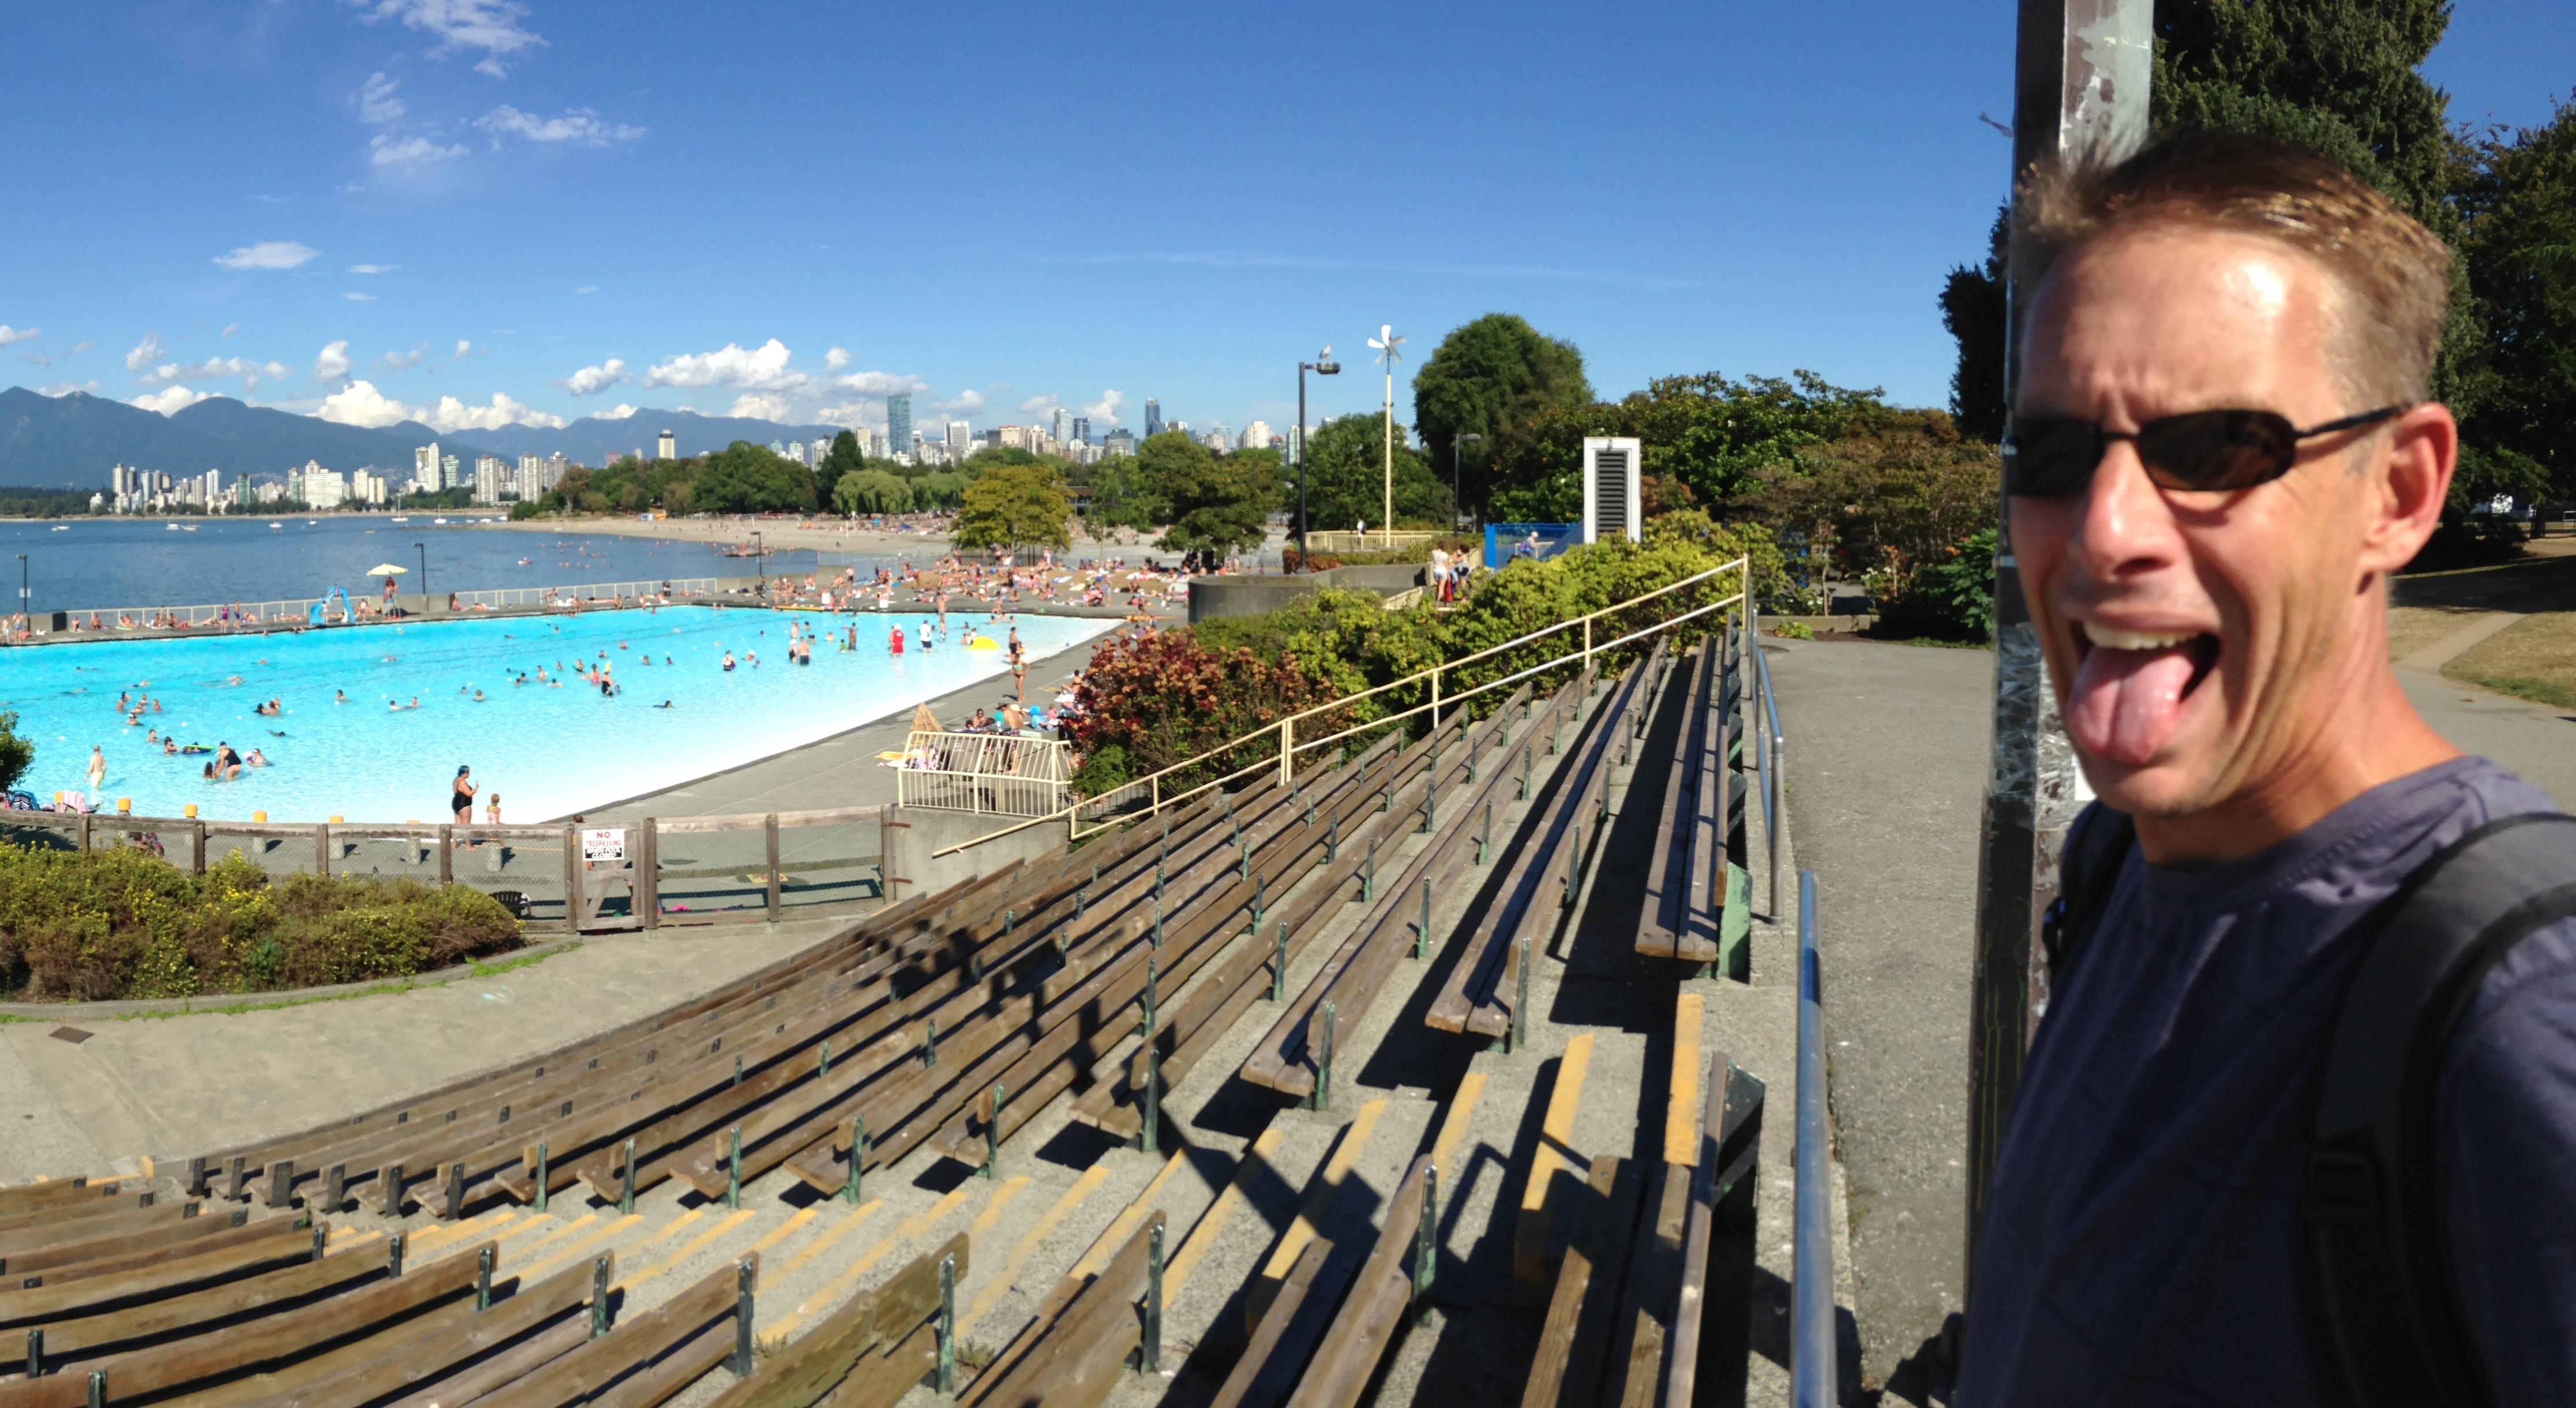 0169 - Kitsilano Pool (Vancouver)